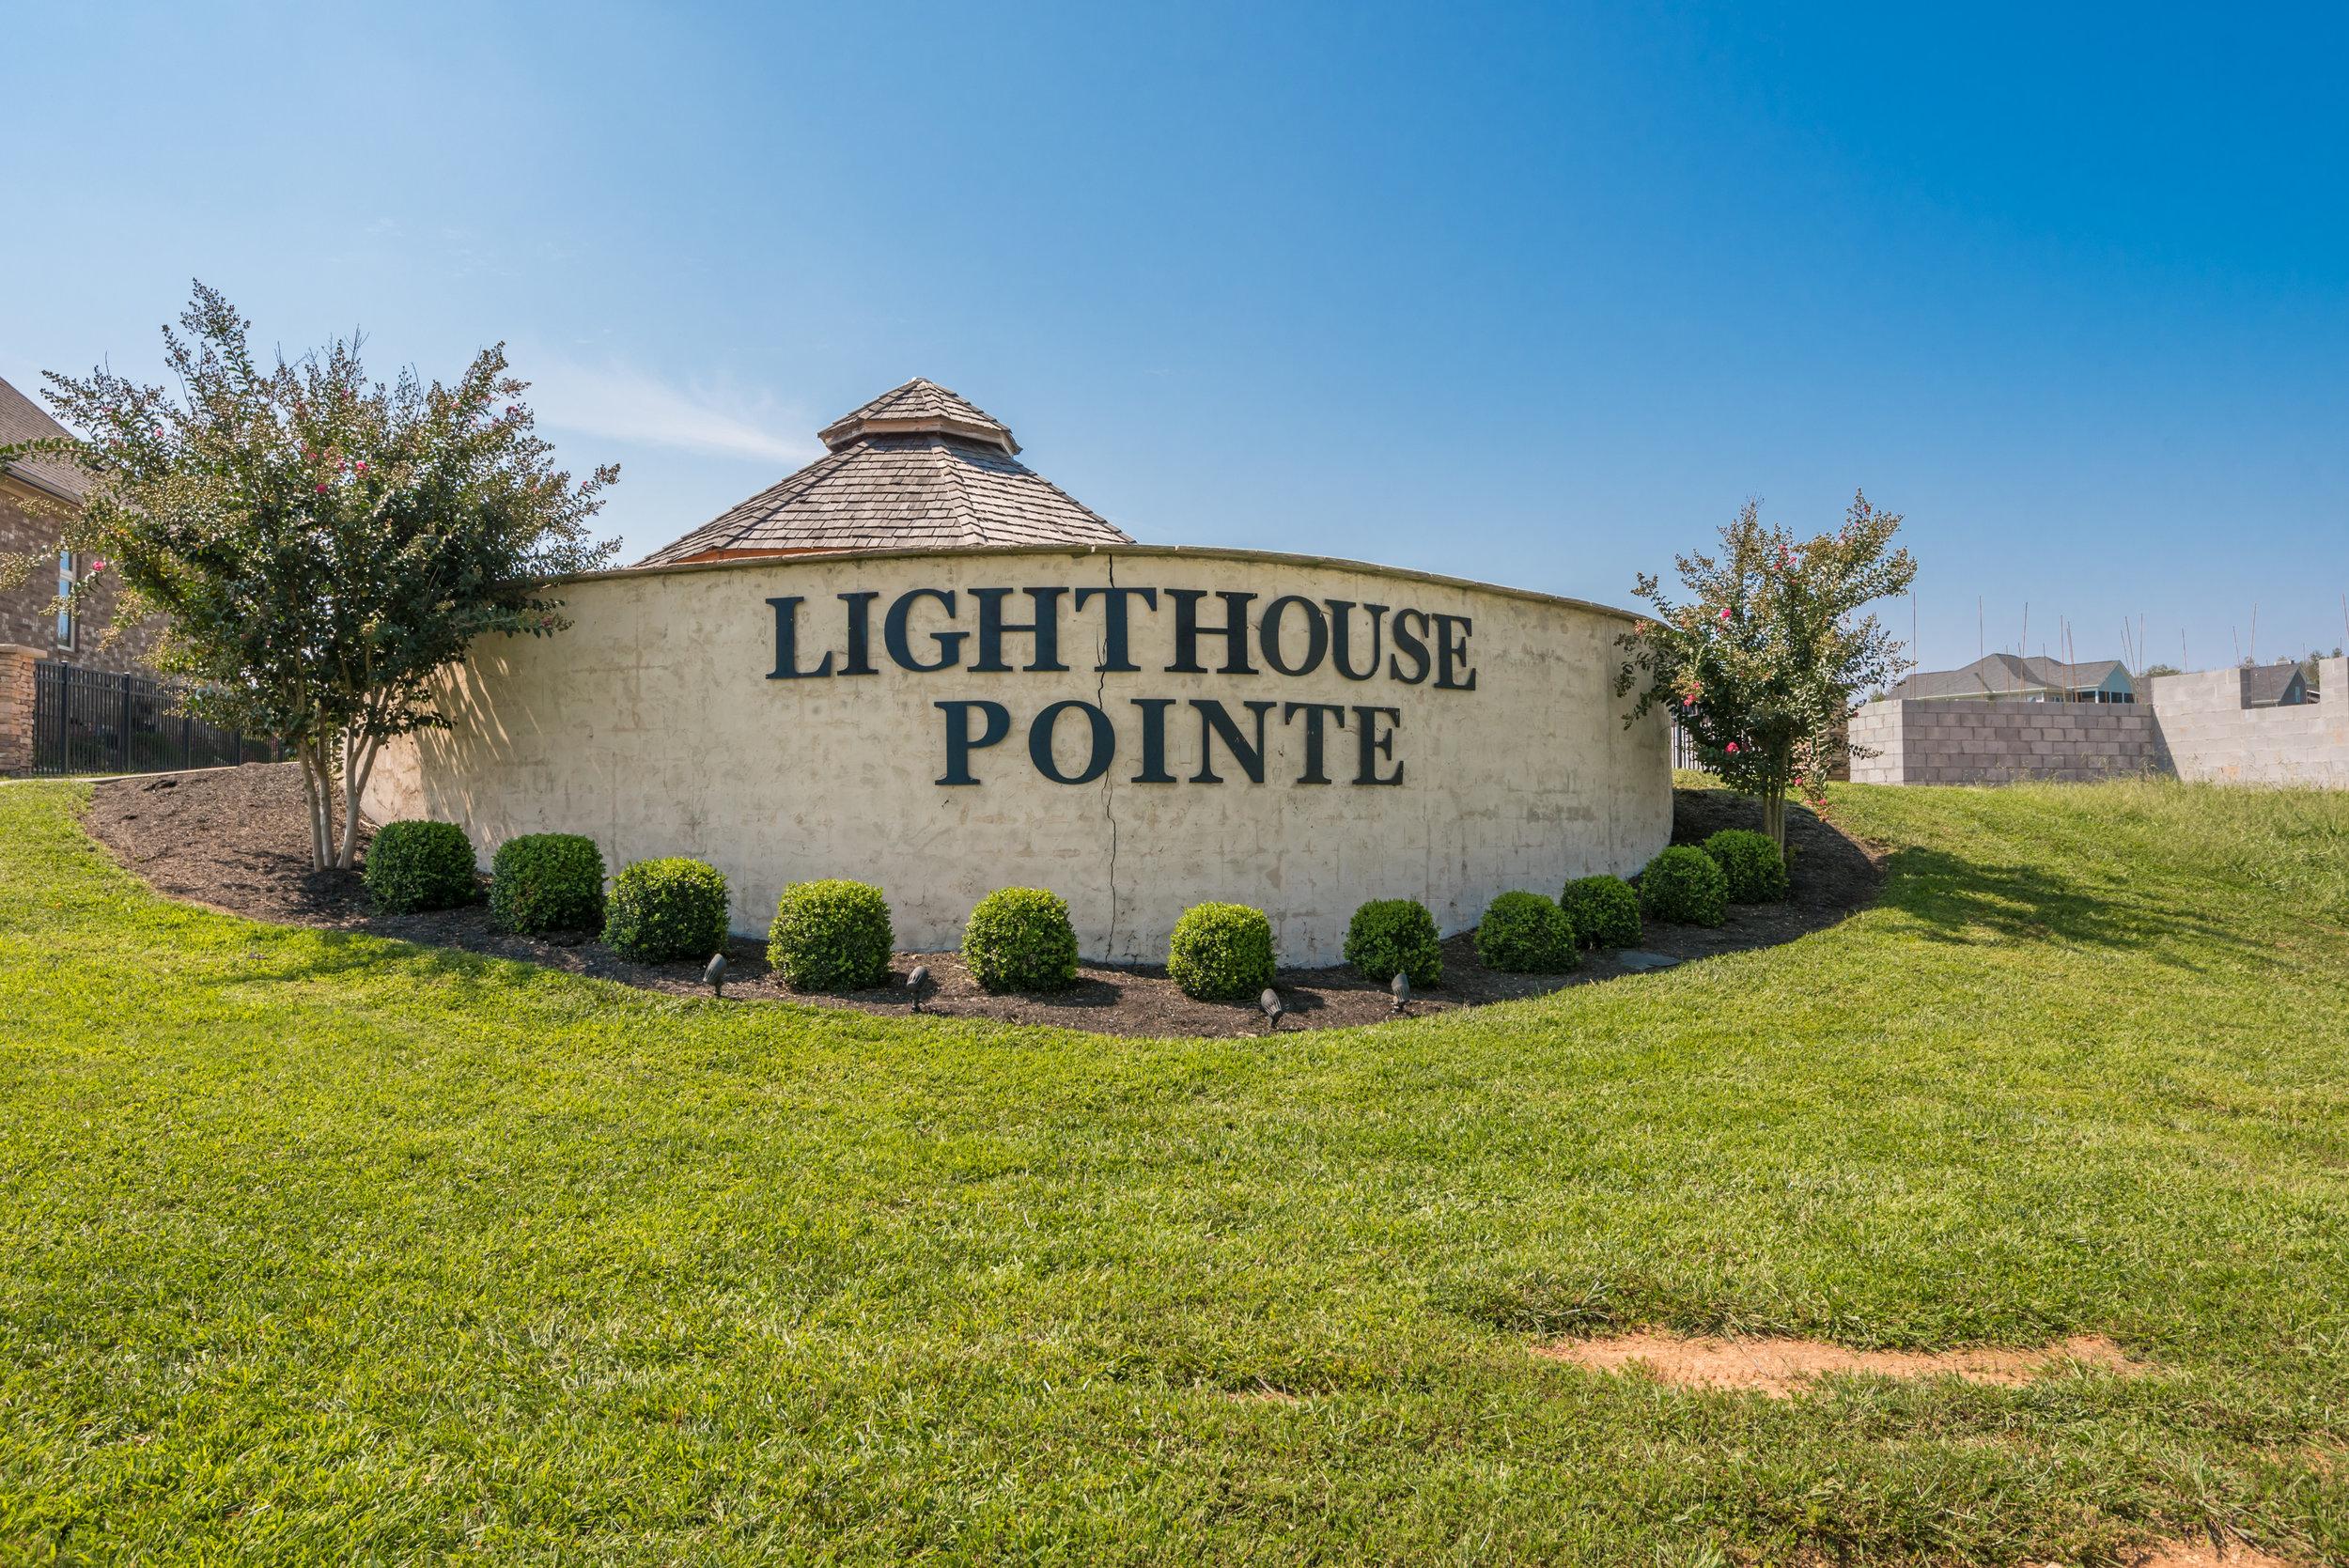 LighthousePointe1-4.jpg